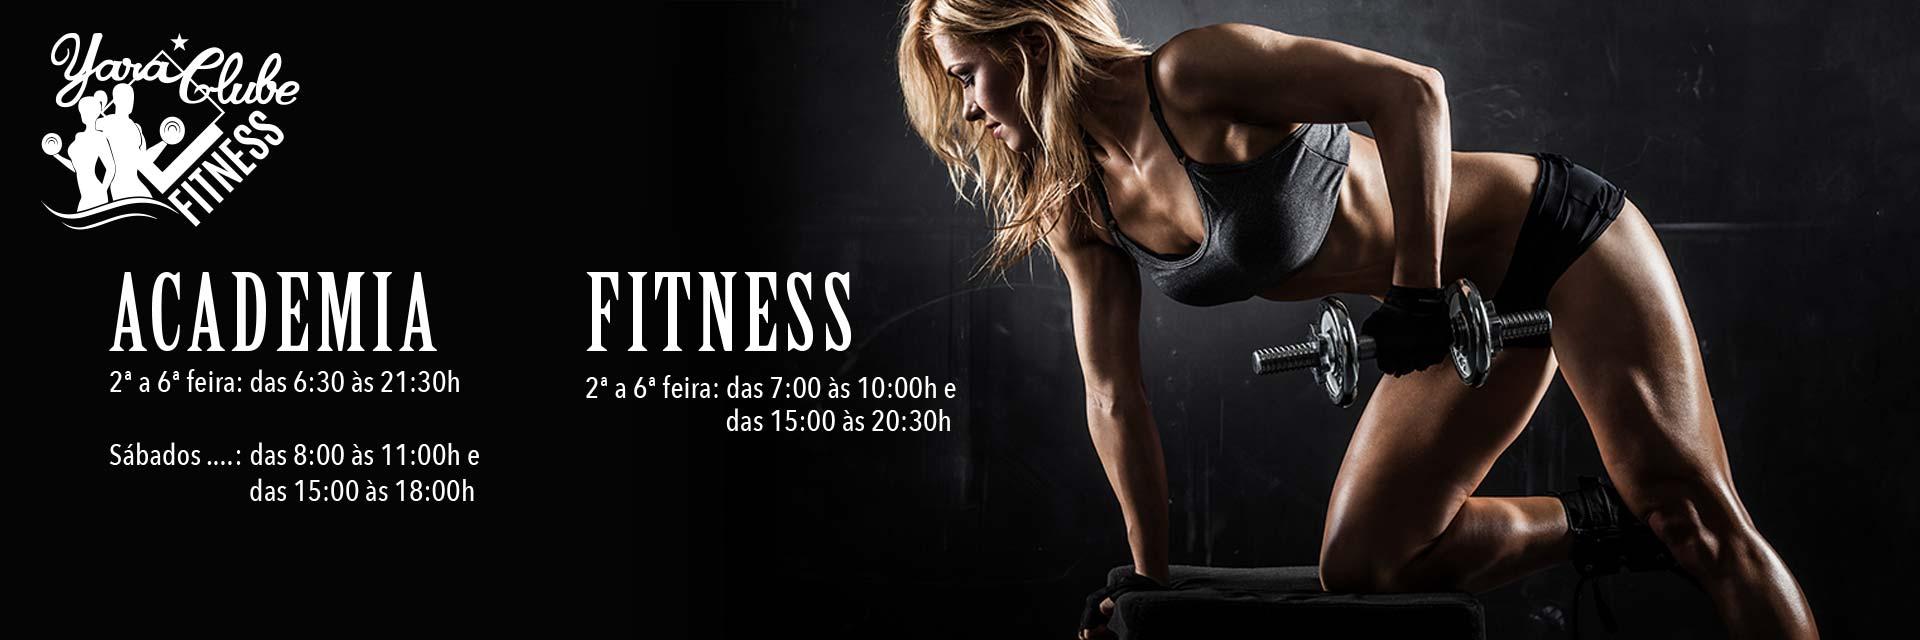 Academia e Fitness